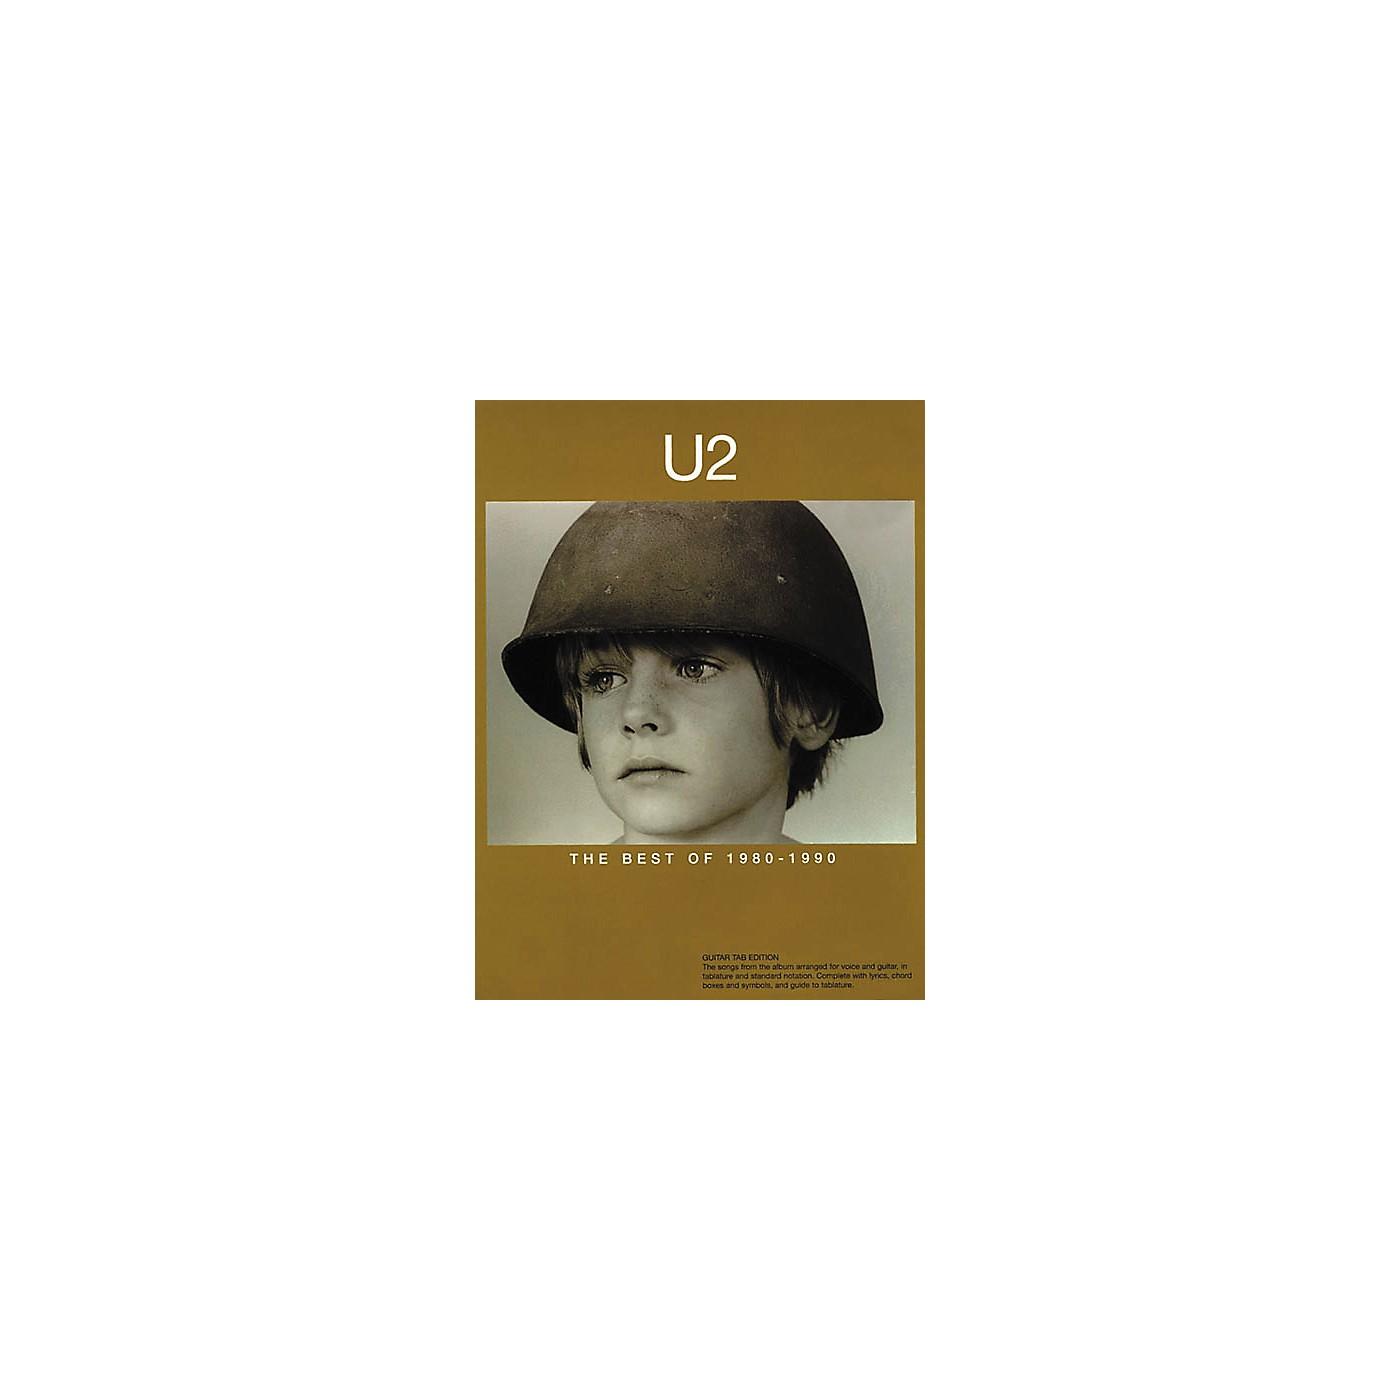 Hal Leonard U2 The Best of 1980-1990 Guitar Tab Songbook thumbnail